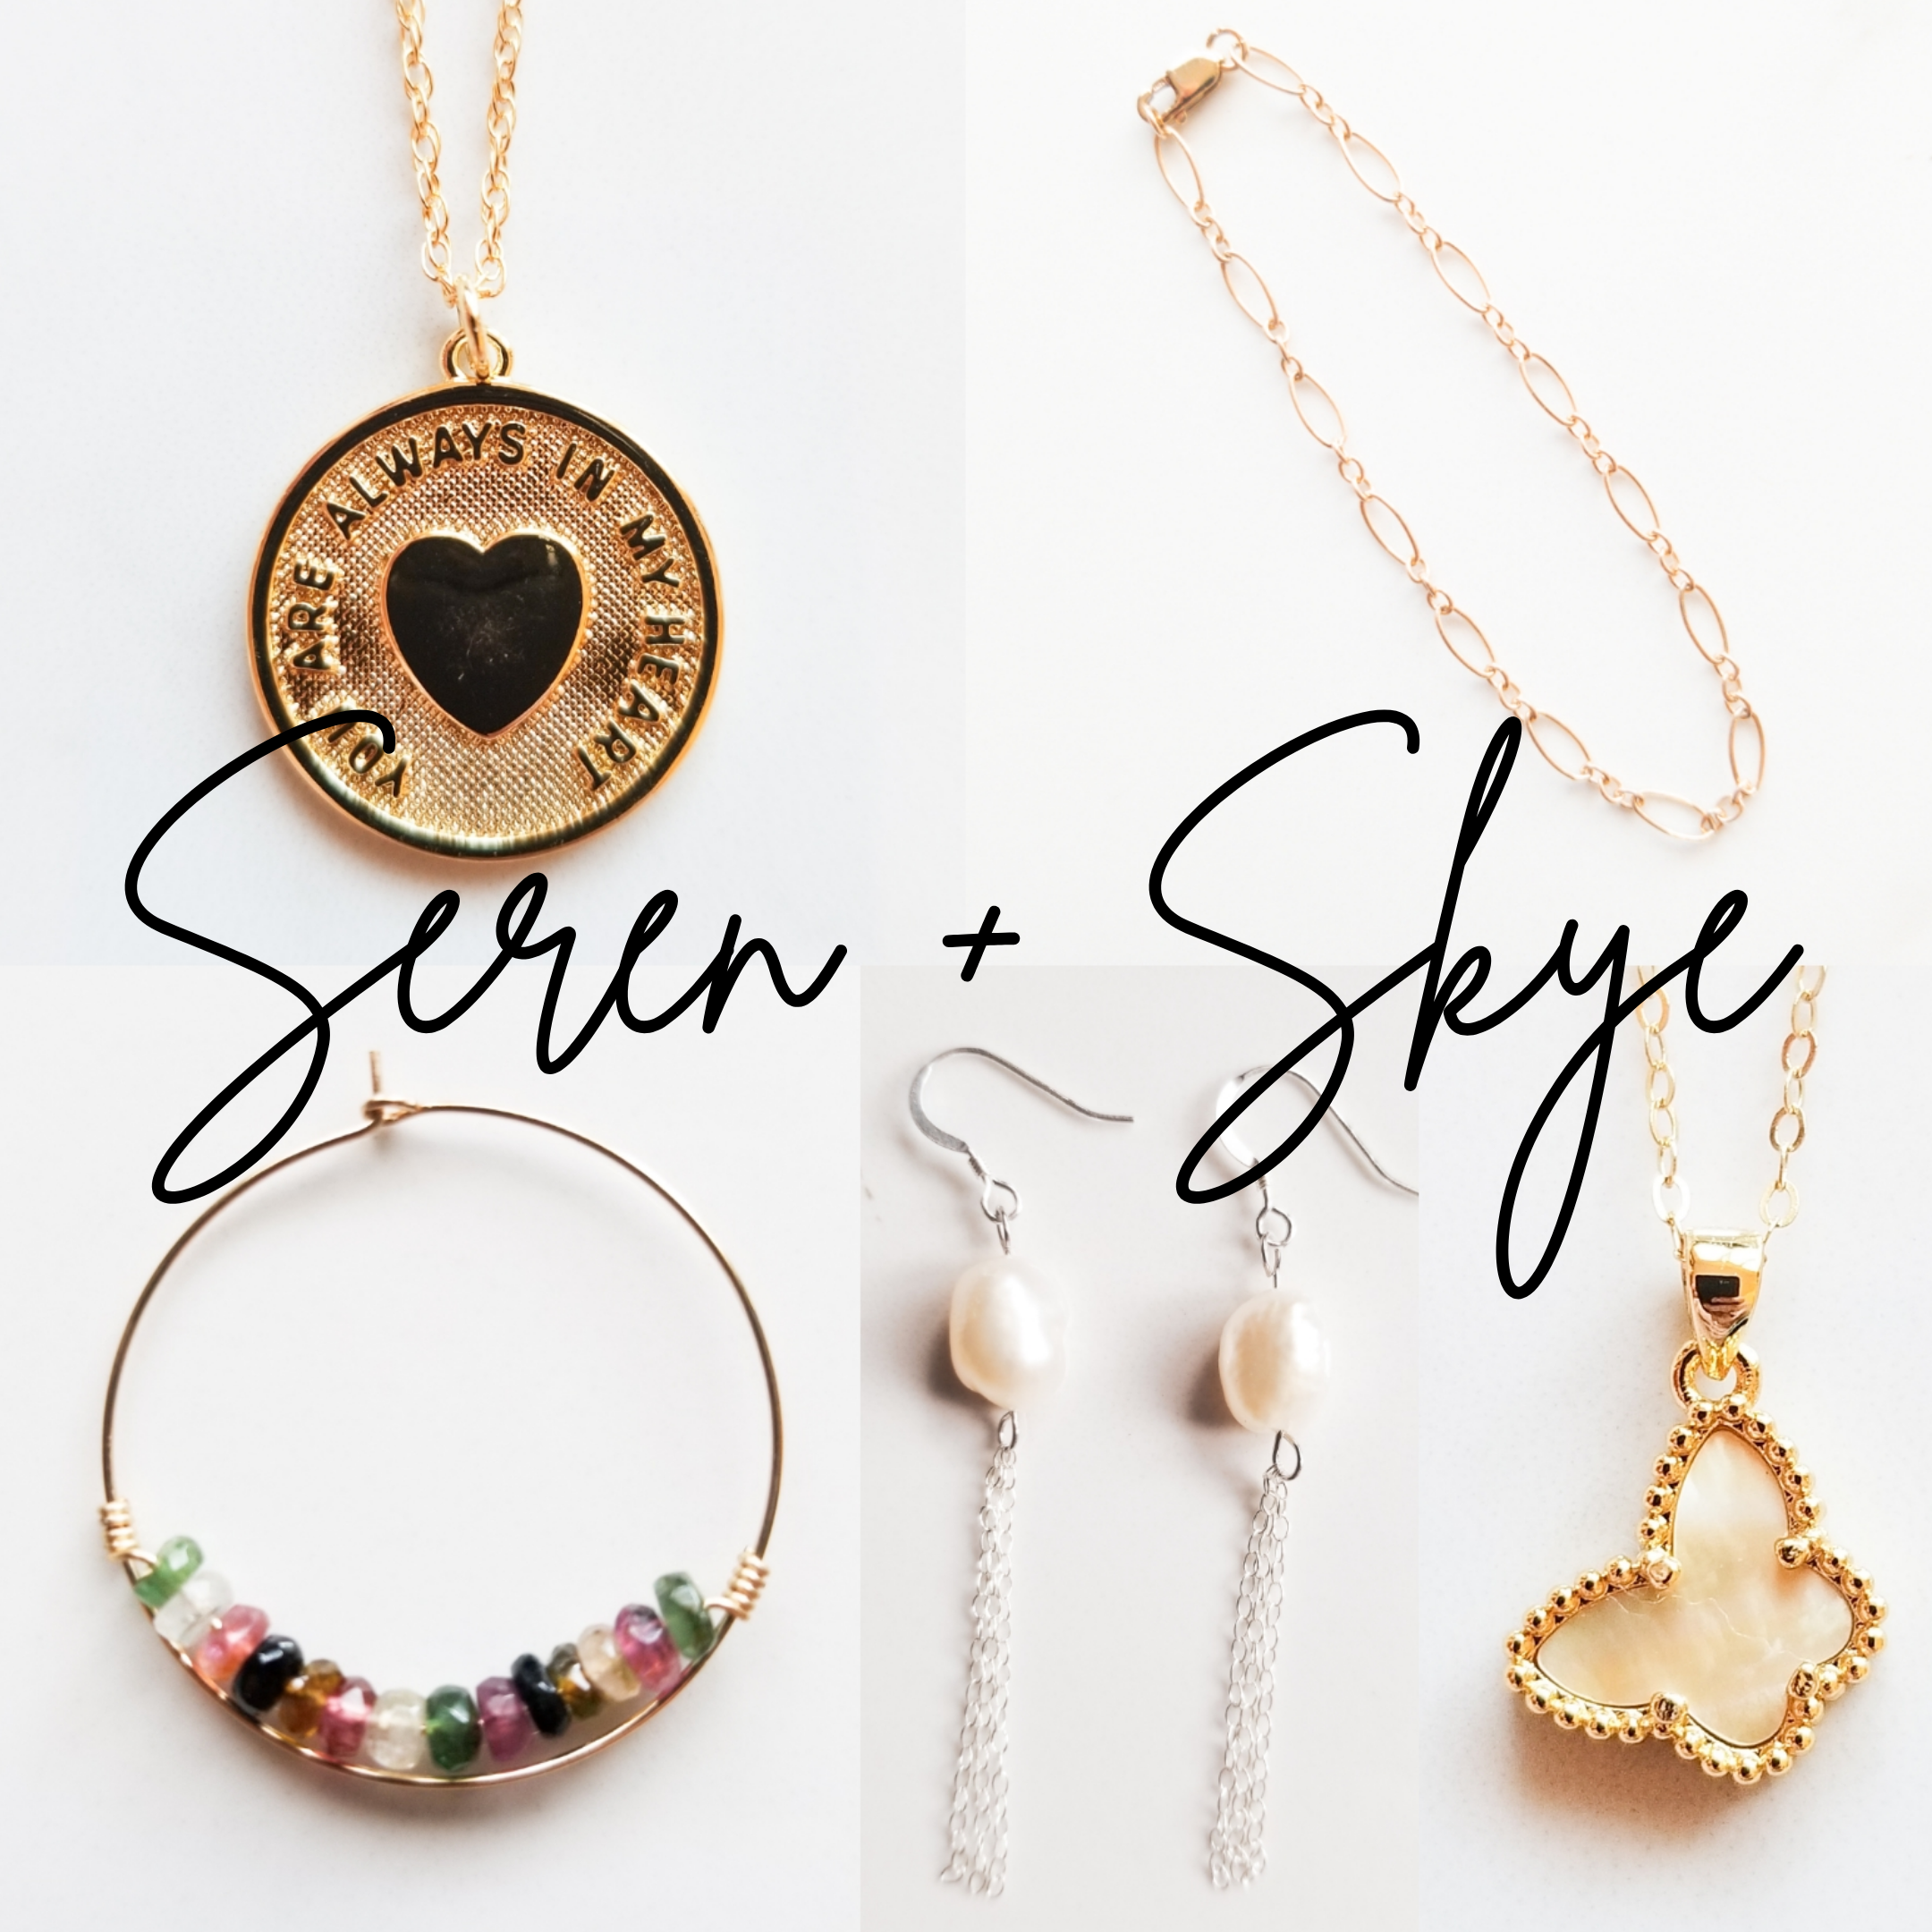 Seren + Skye